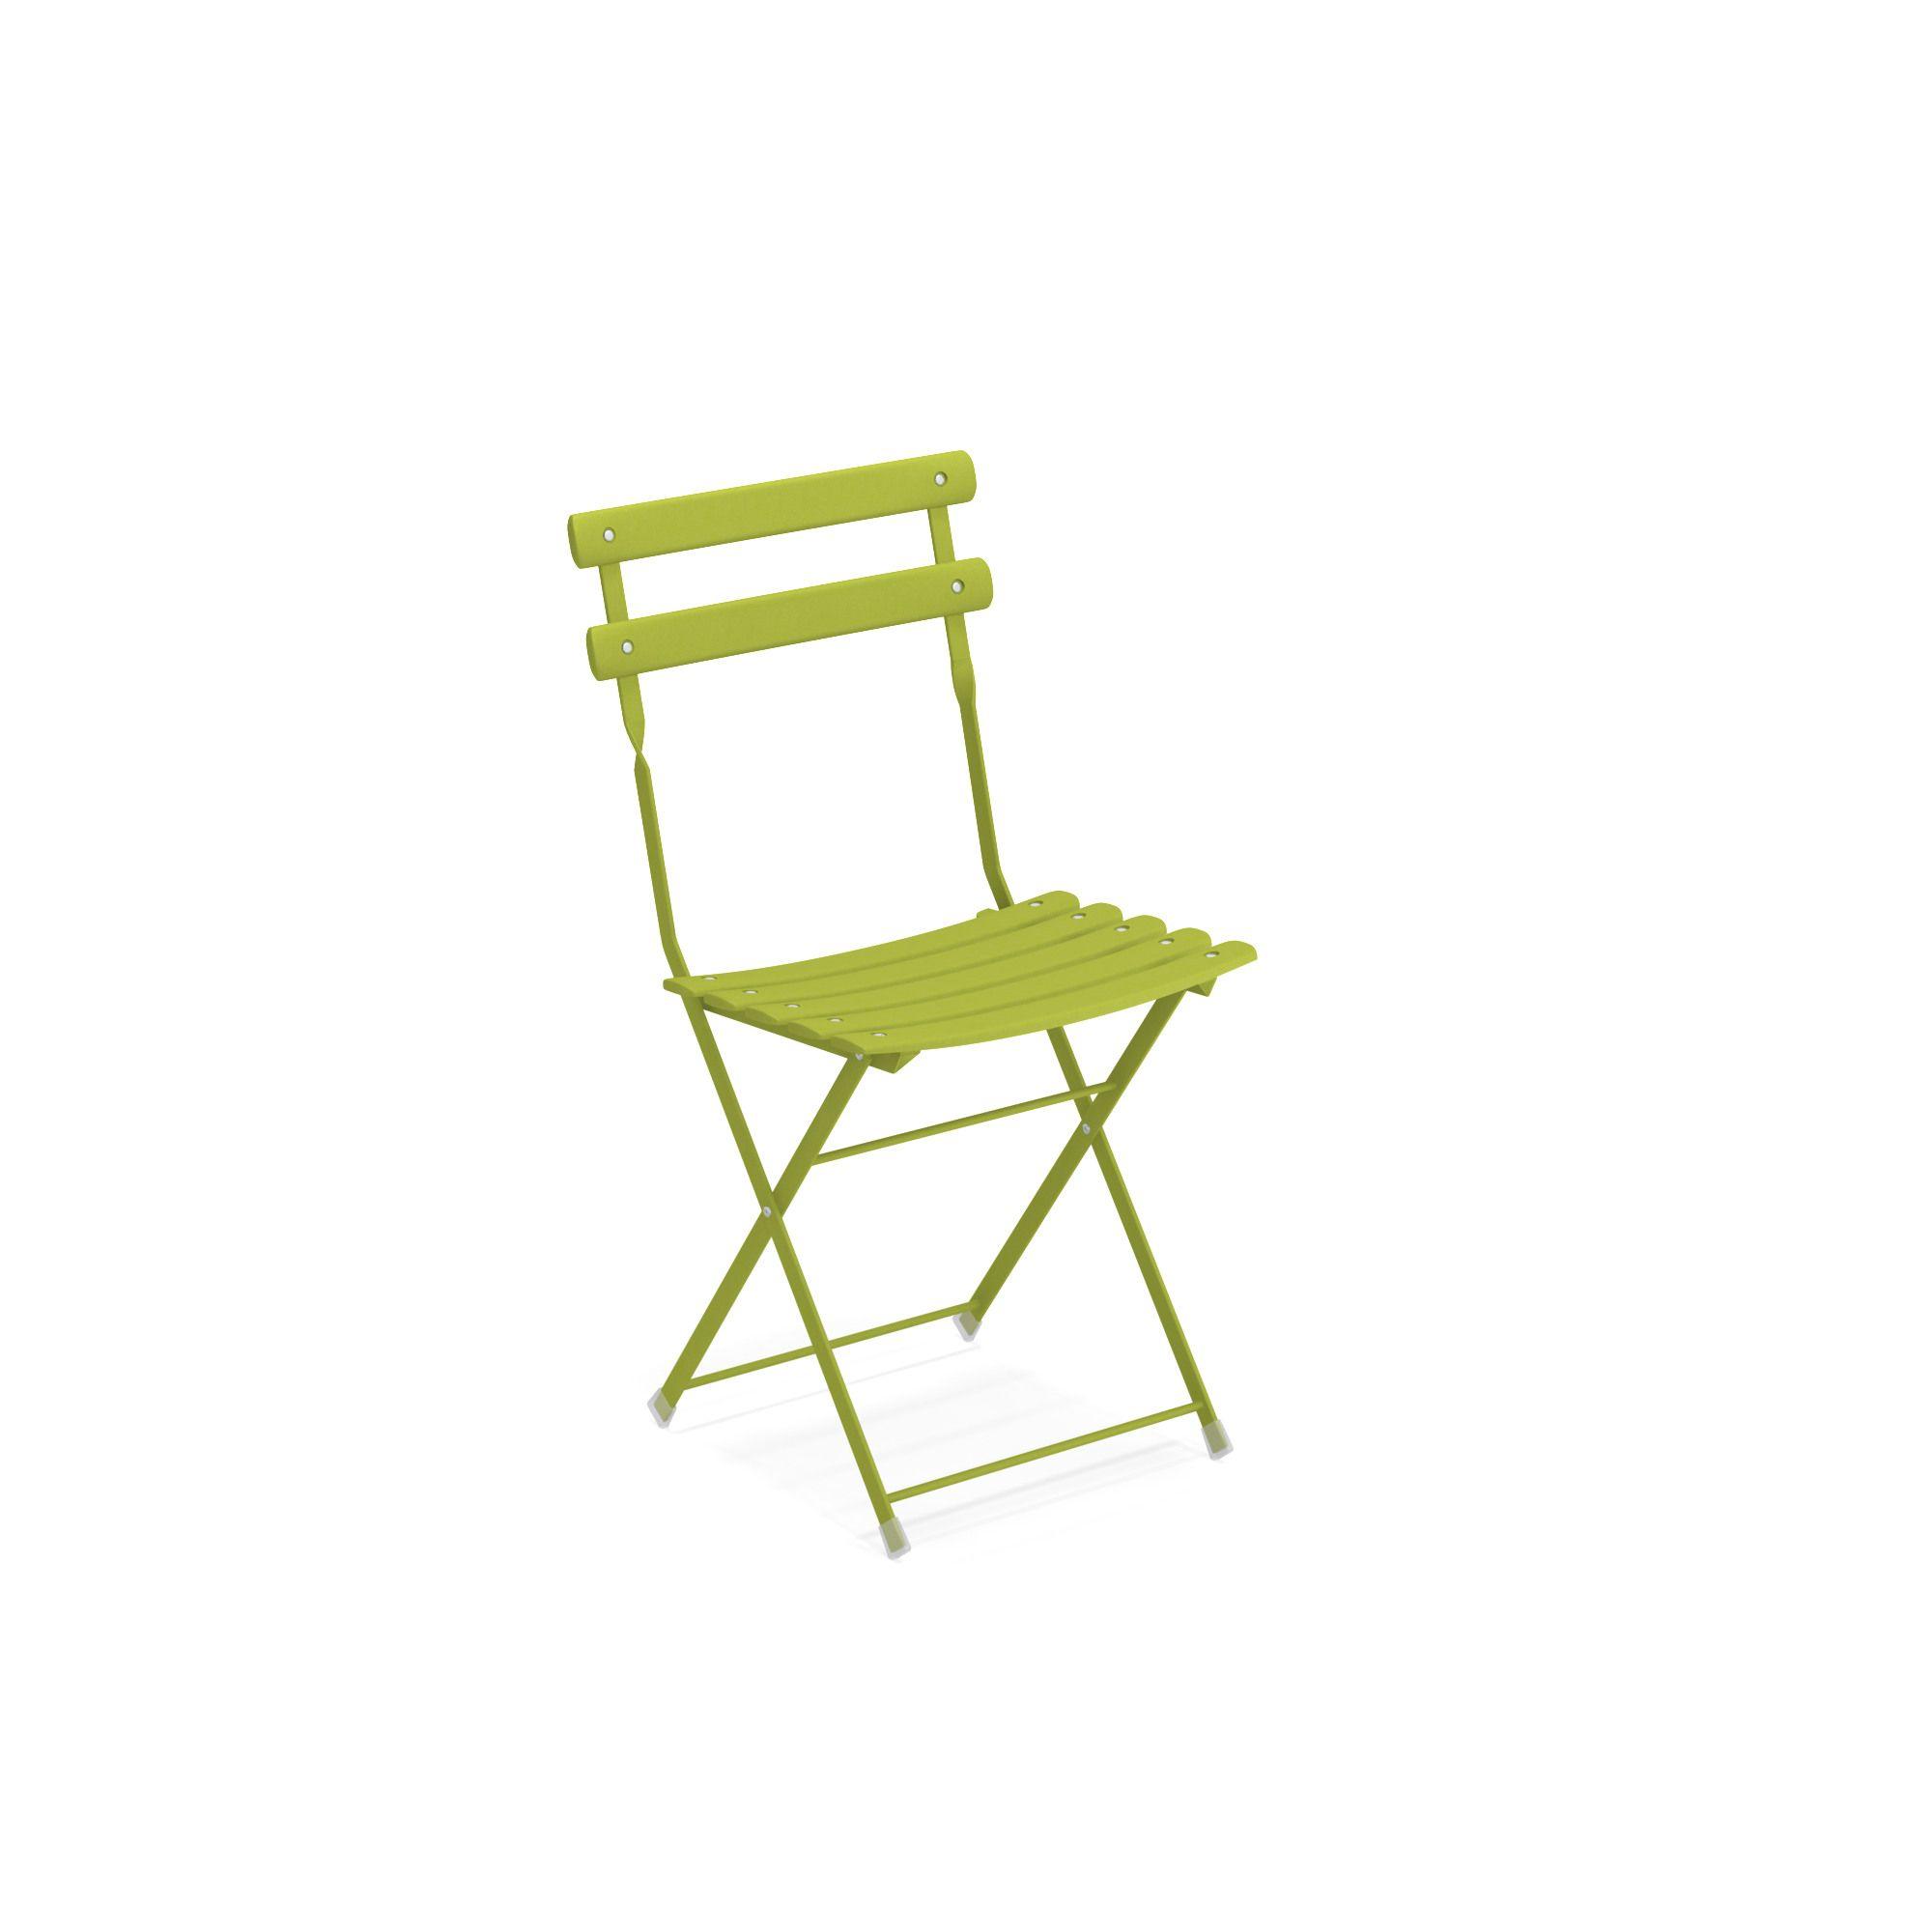 emuamericas, llc 314-60 chair, folding, outdoor